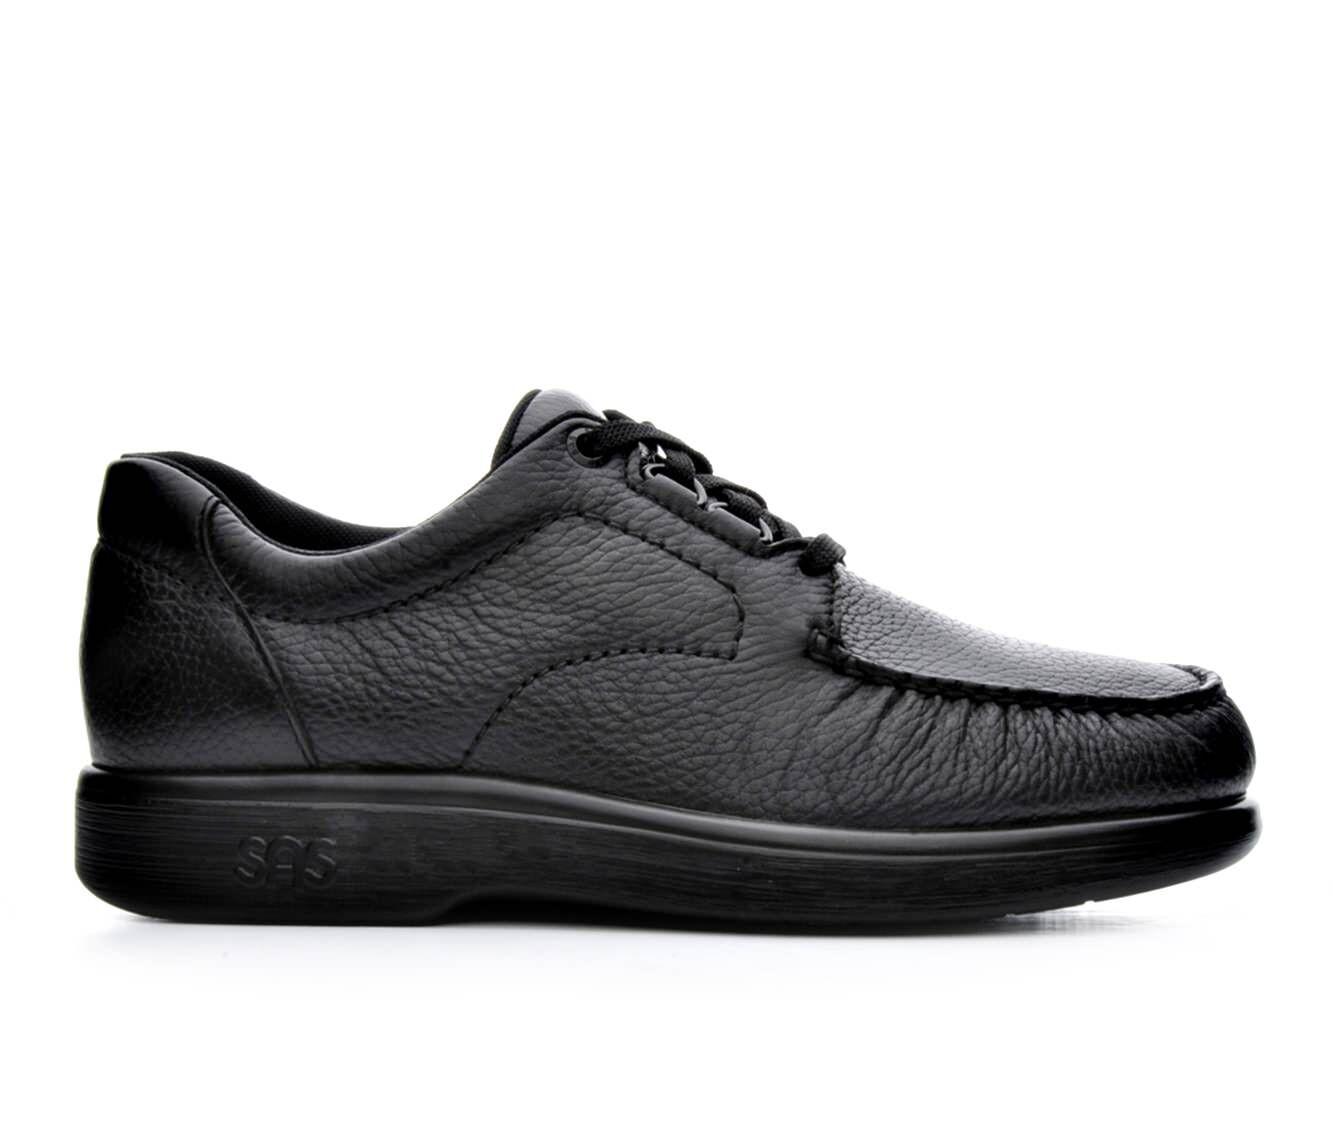 Men's Sas Bout Time Casual Shoes